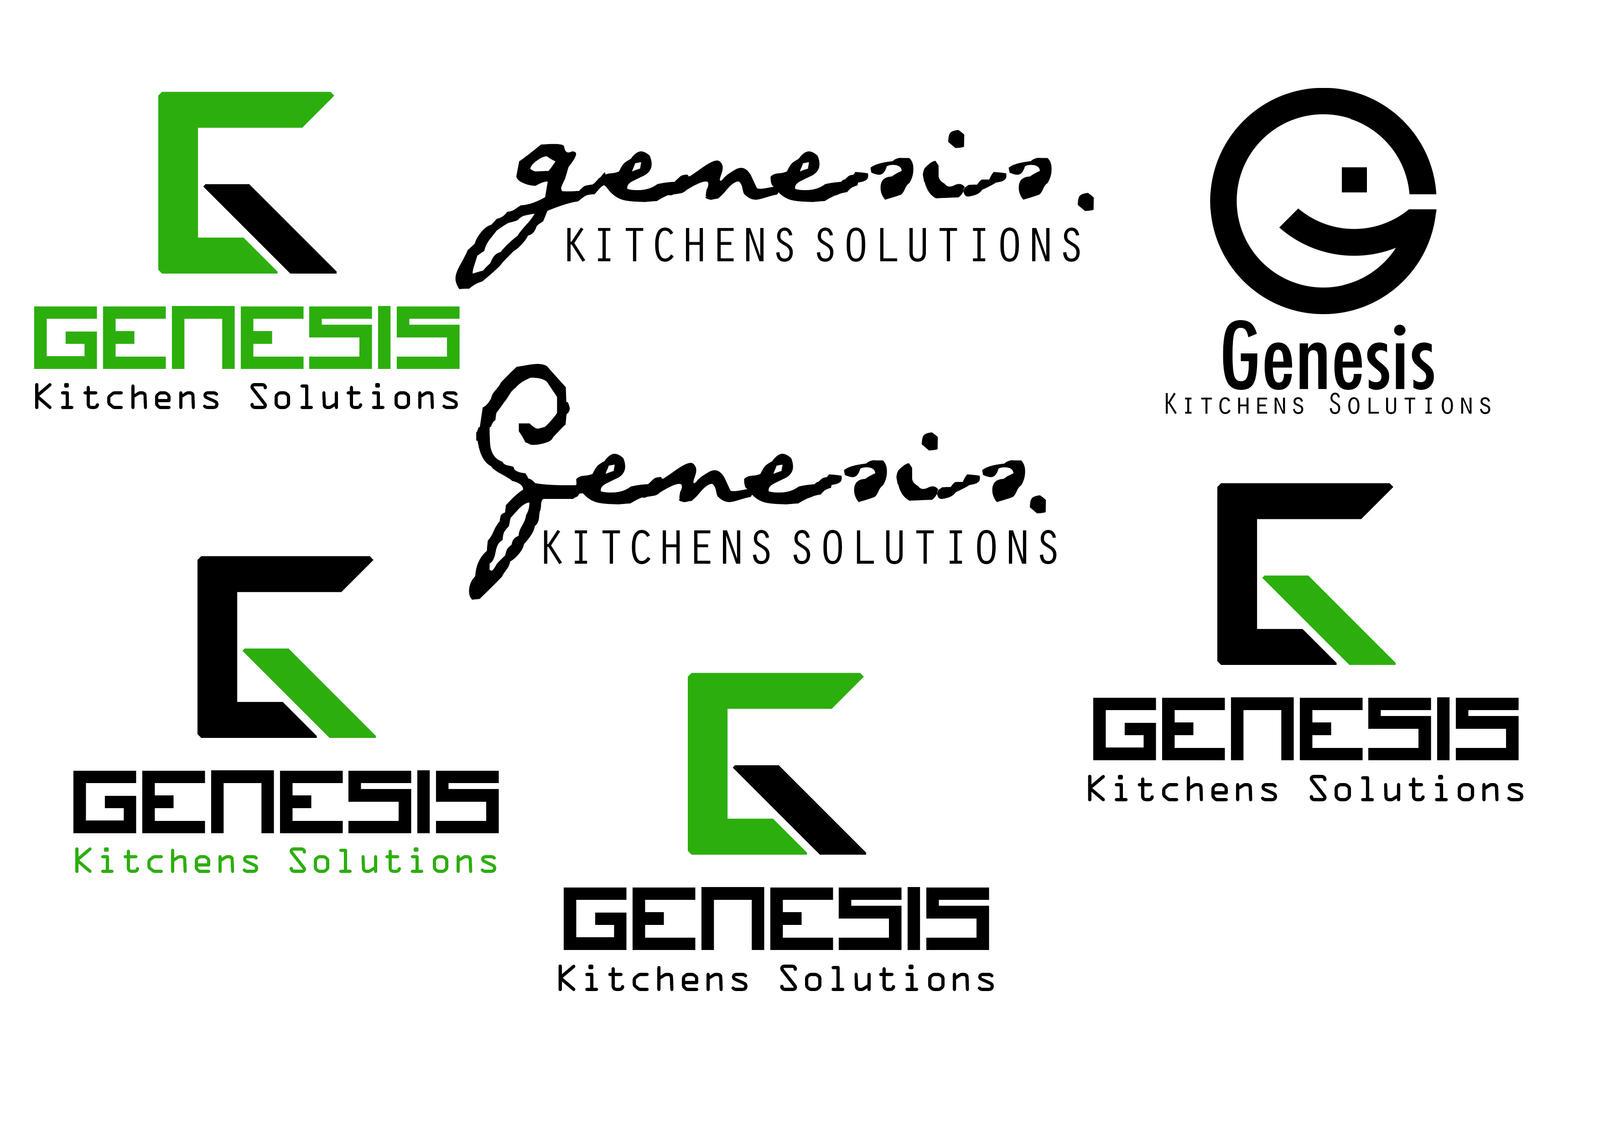 Genesis kitchens solutions logo design ideas by thomasdyke for Kitchen remodel logo